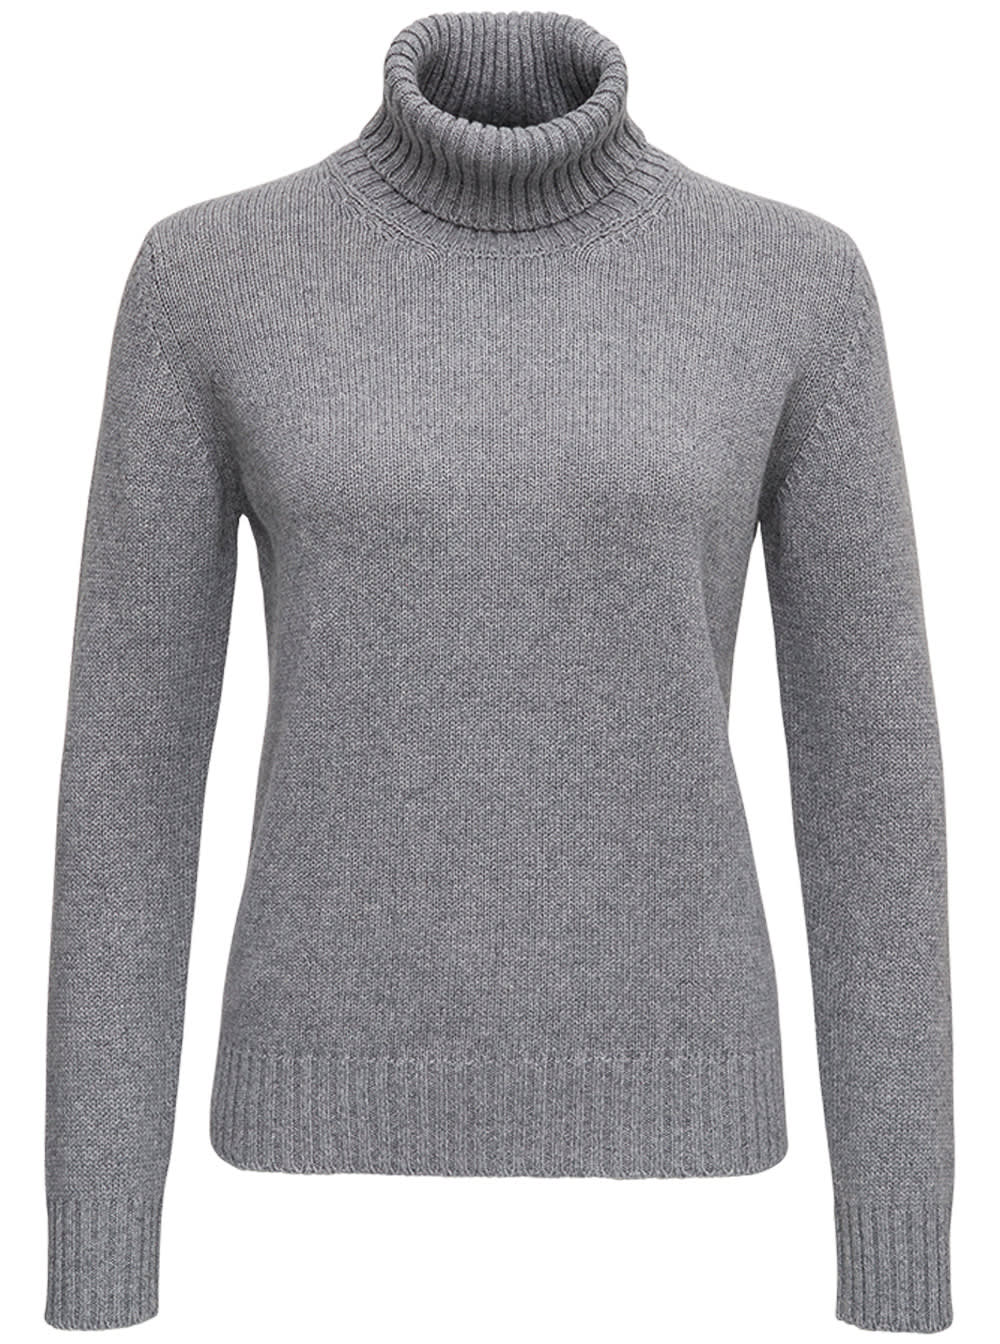 Grey Cashmere Turtleneck